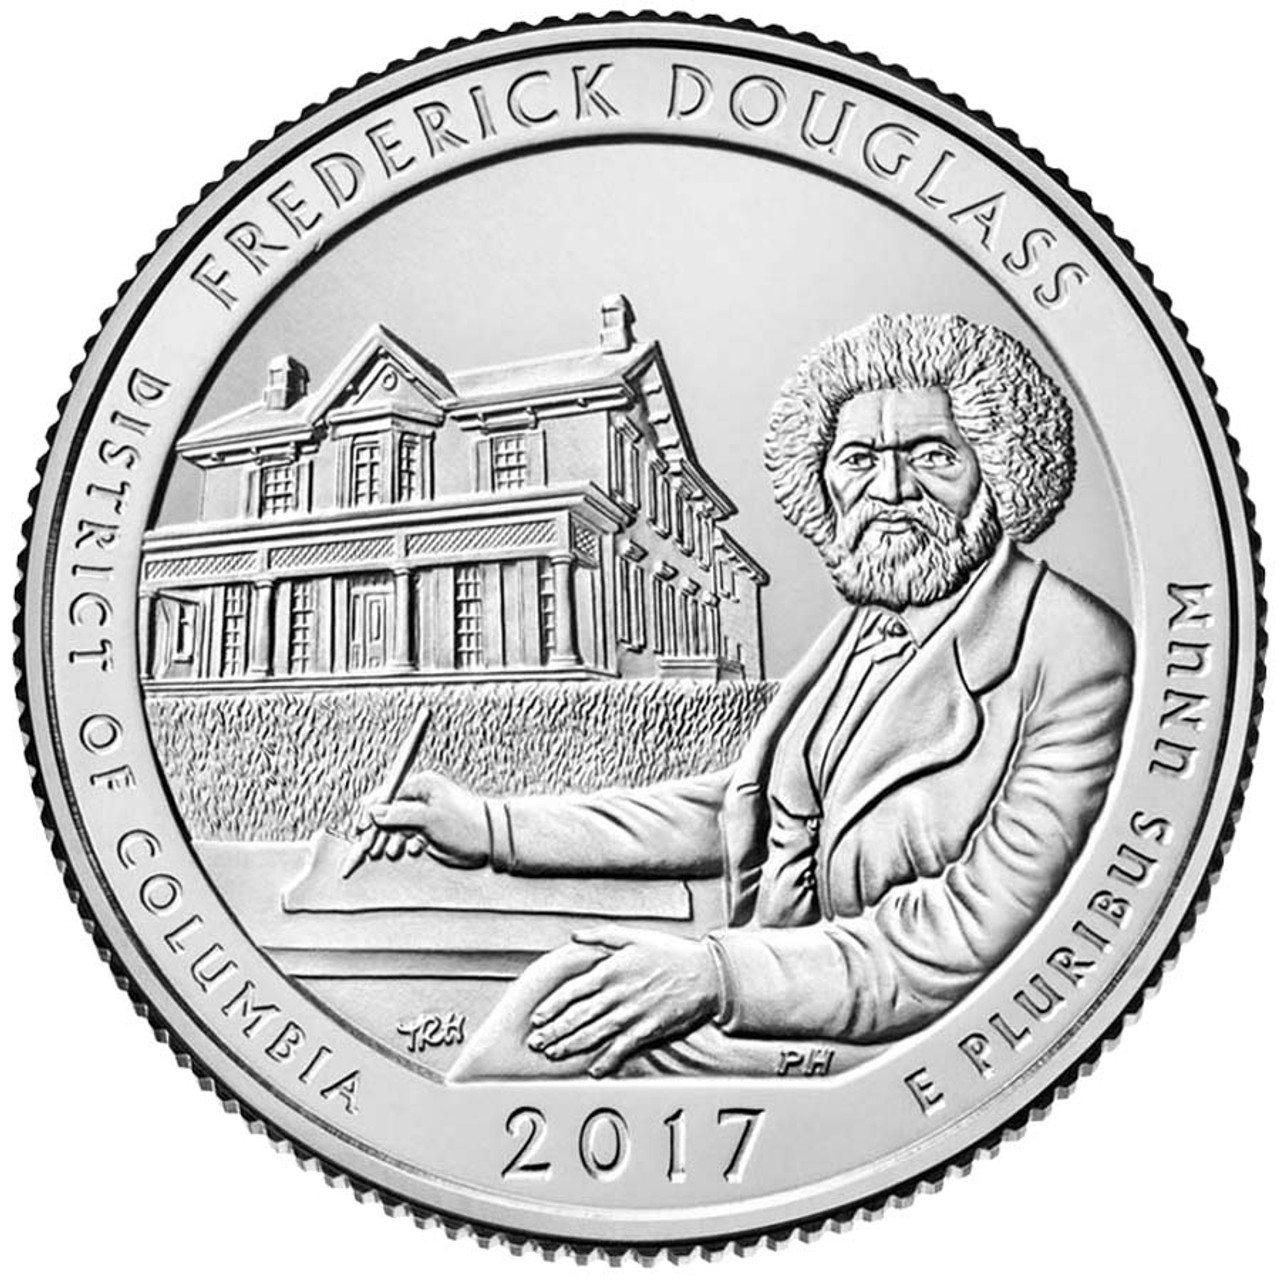 2017-P Frederick Douglass National Historic Site Quarter Brilliant Uncirculated Image 1